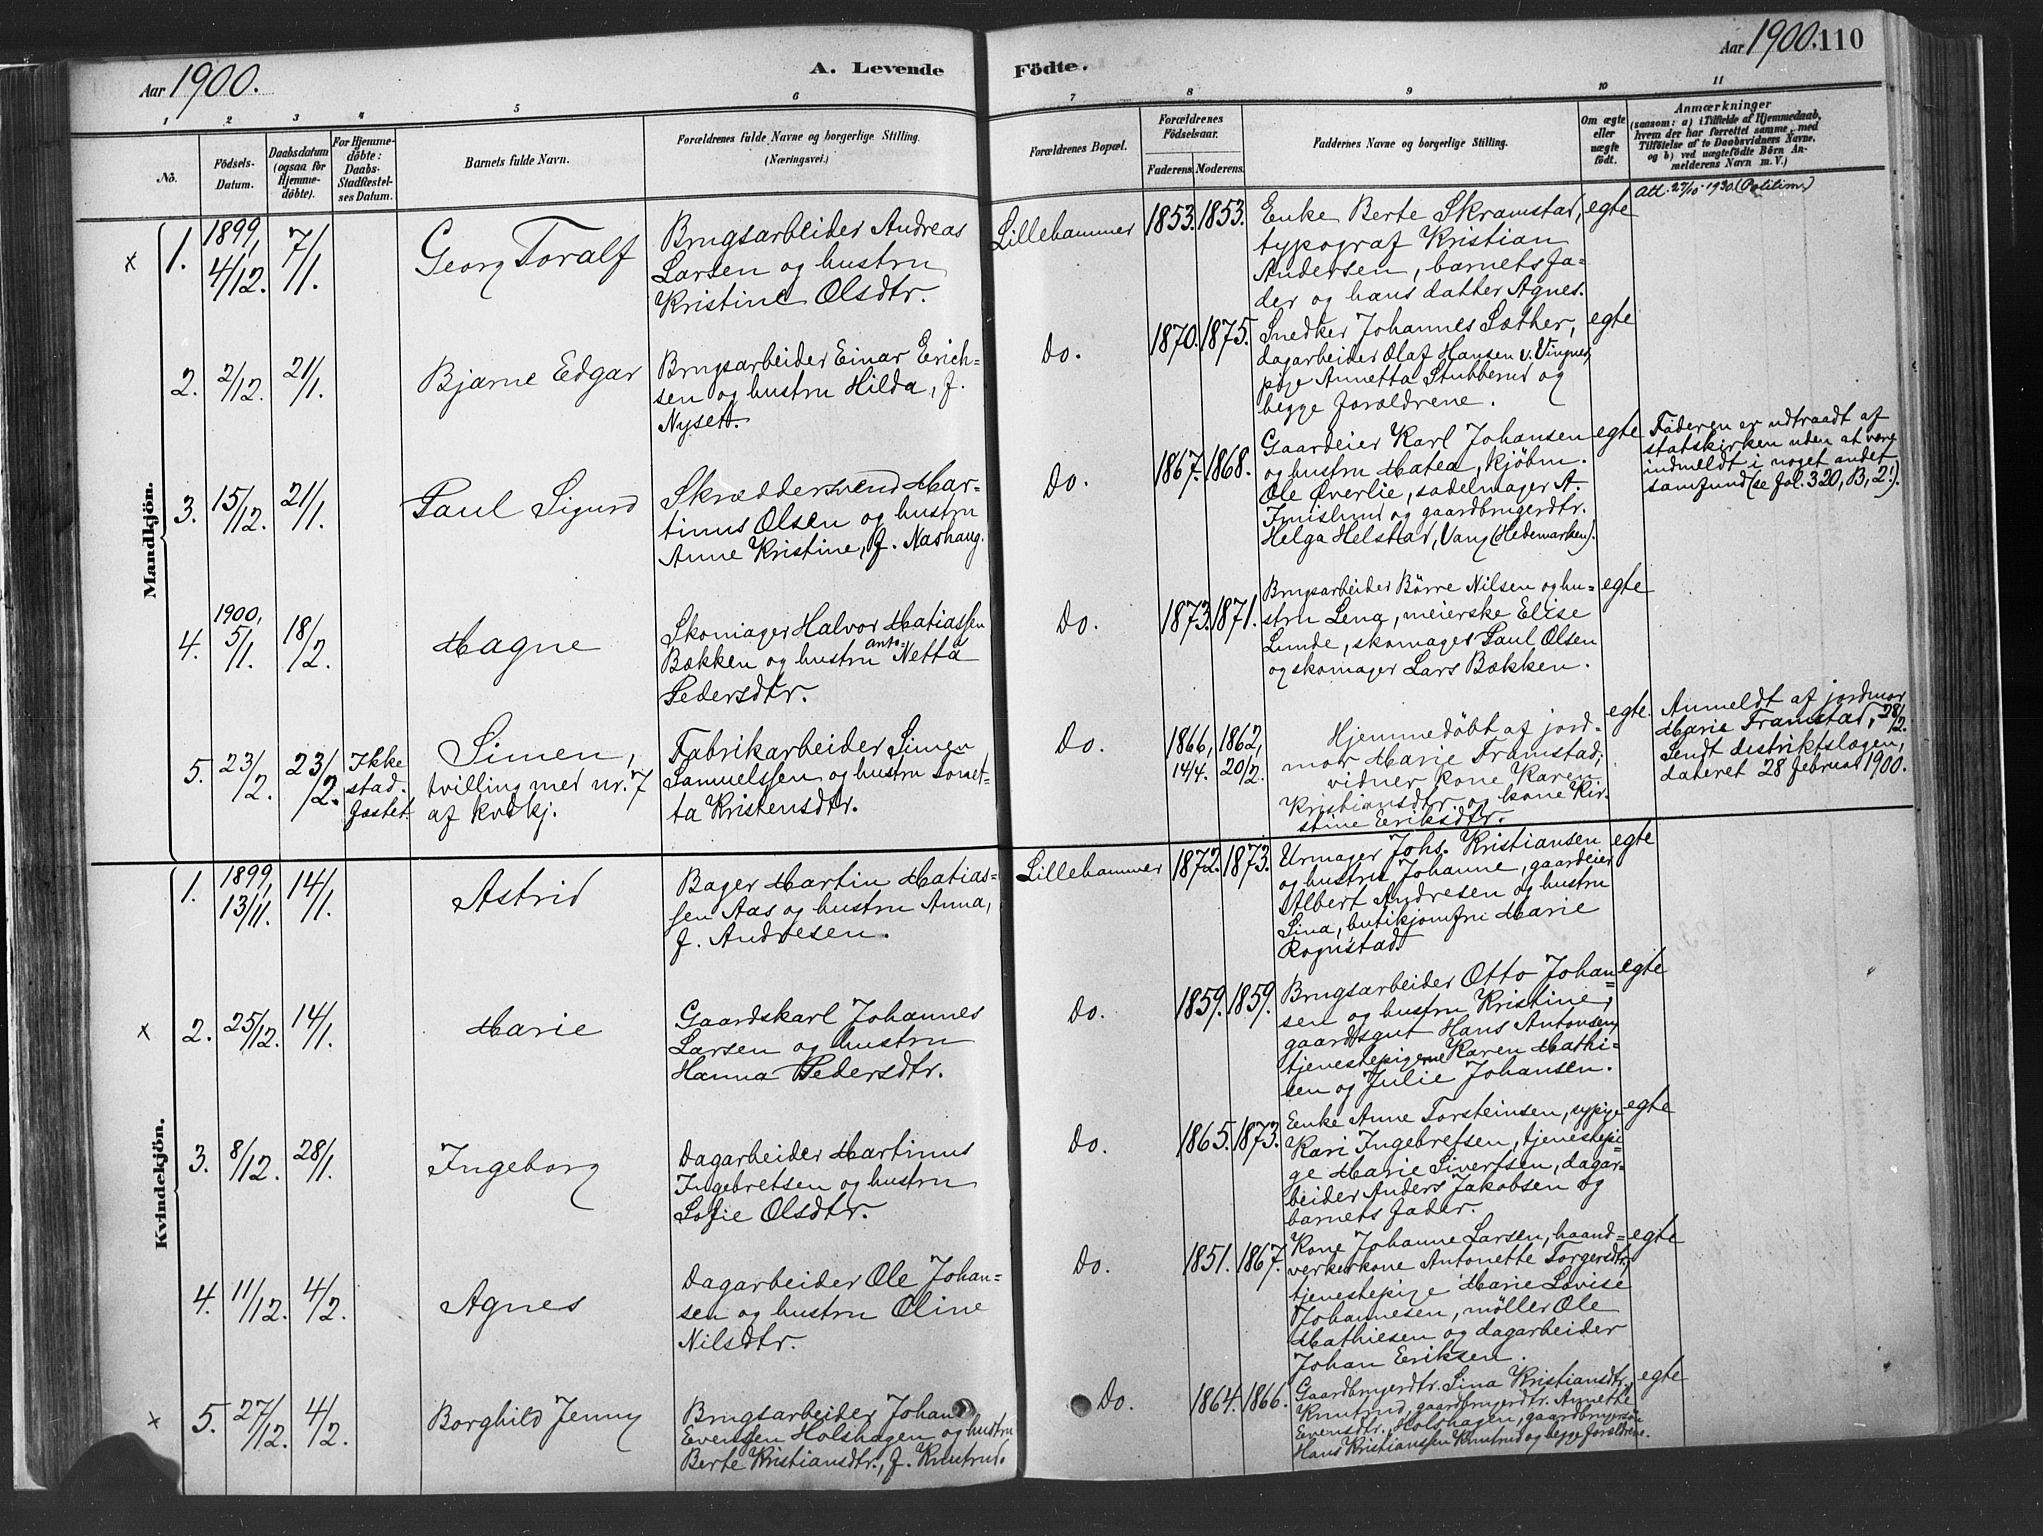 SAH, Fåberg prestekontor, H/Ha/Haa/L0010: Parish register (official) no. 10, 1879-1900, p. 110